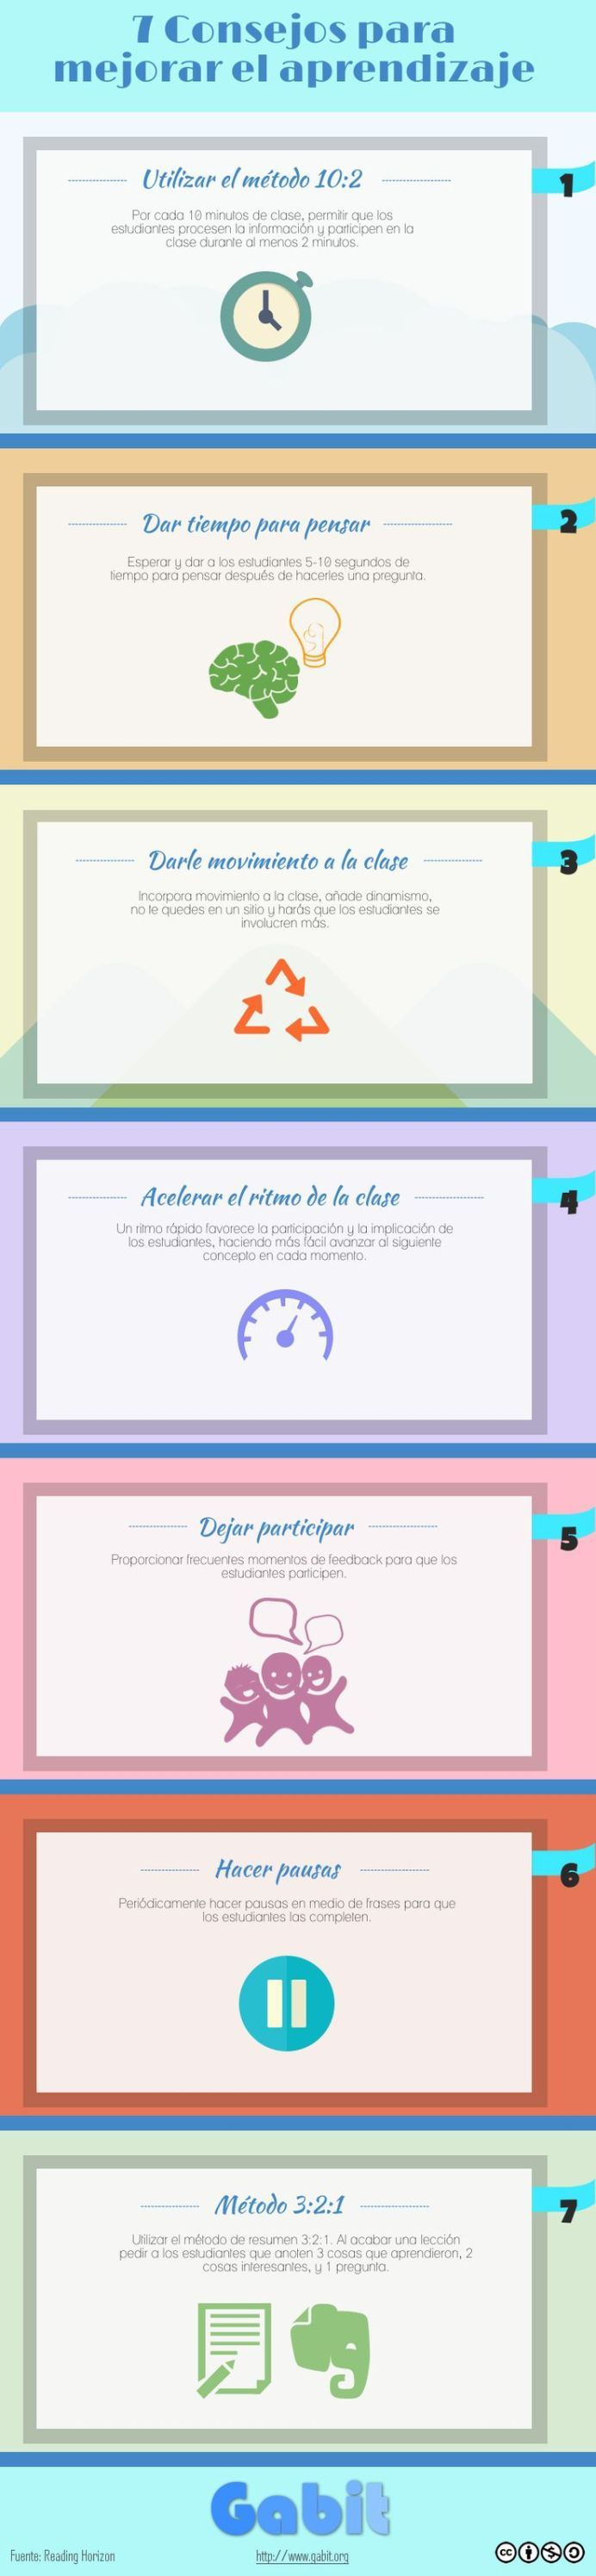 7ConsejosMejorarAprendizajeAula-Infografía-BlogGesvin